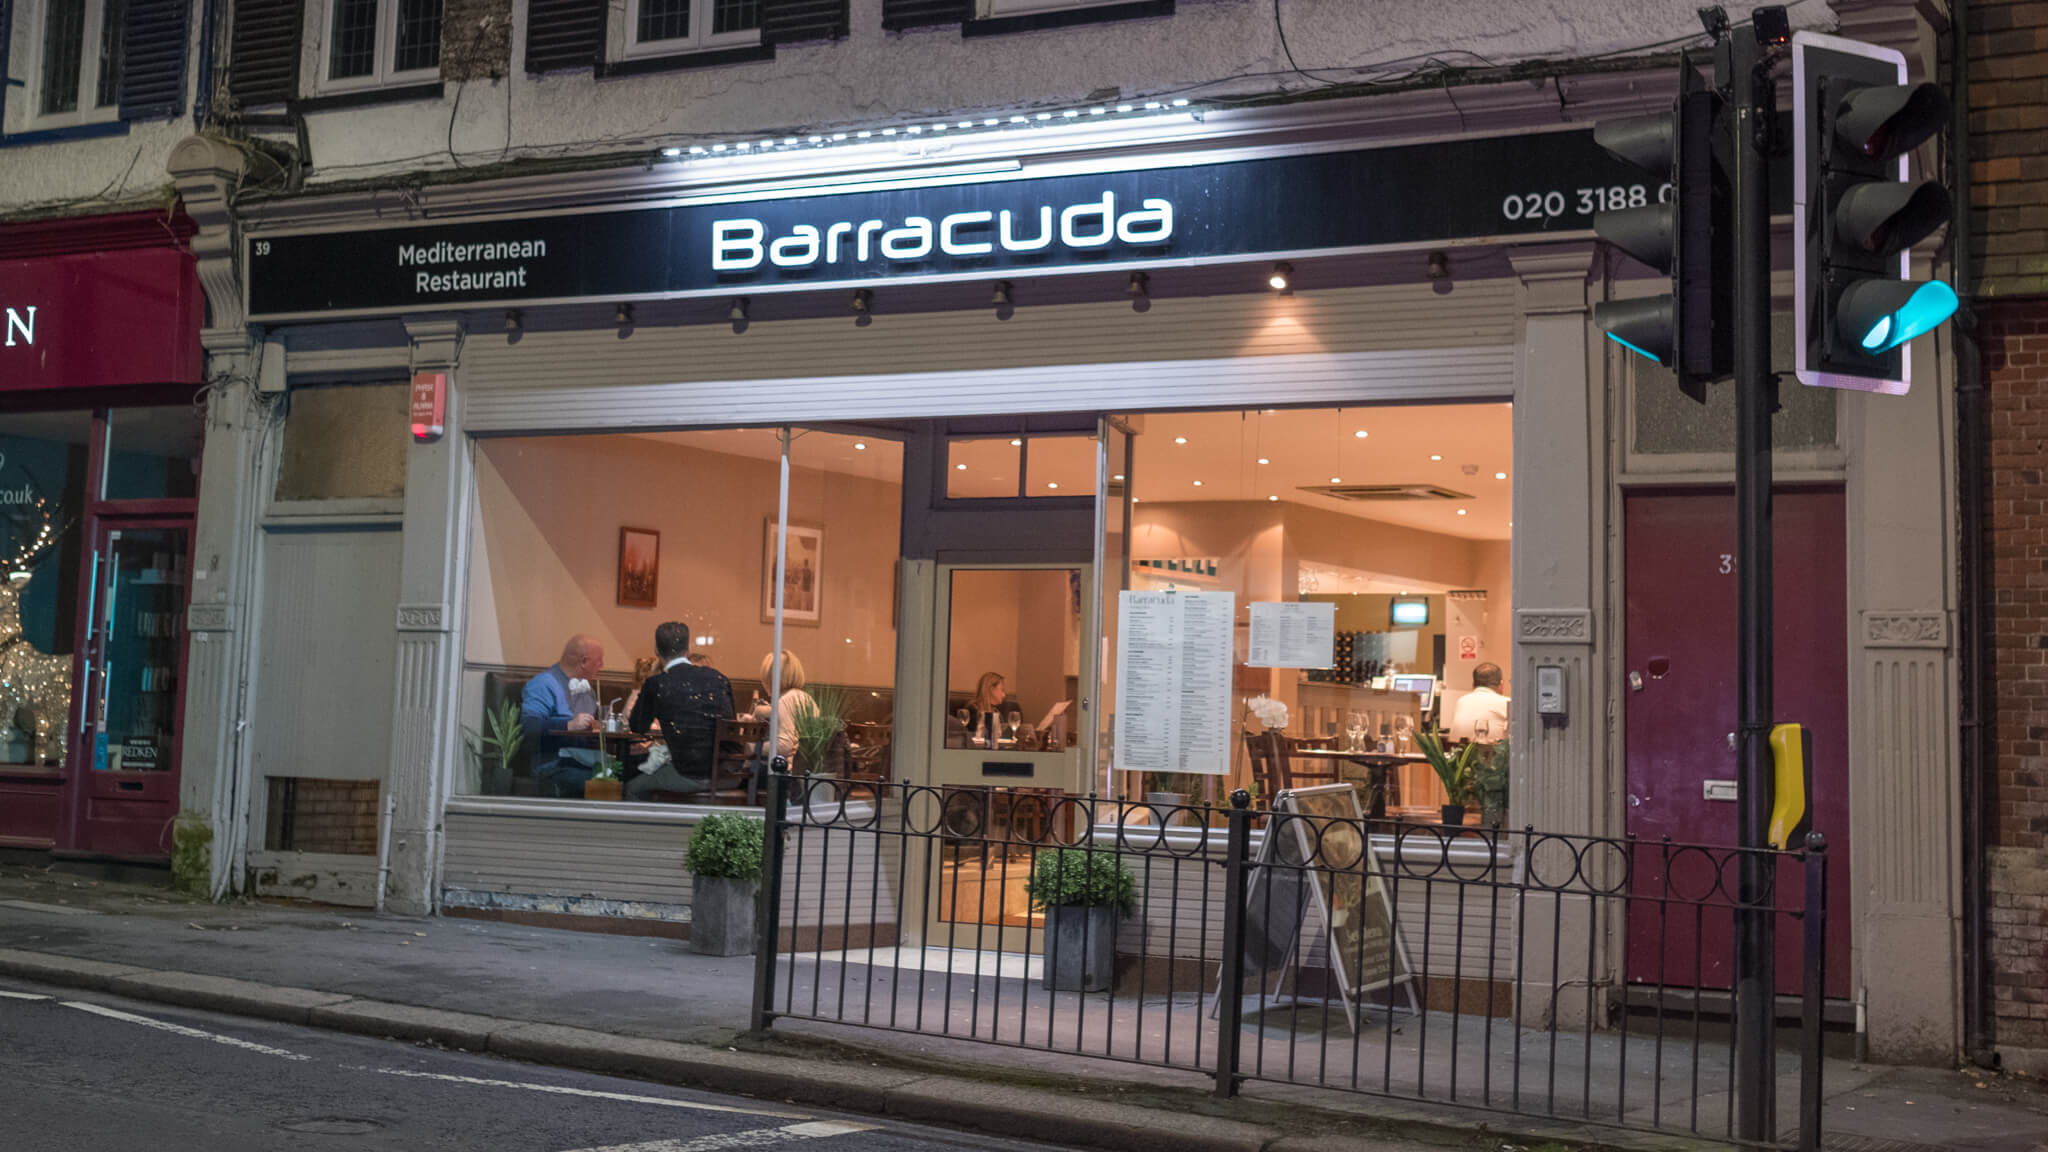 Barracuda Restaurant in Bushey